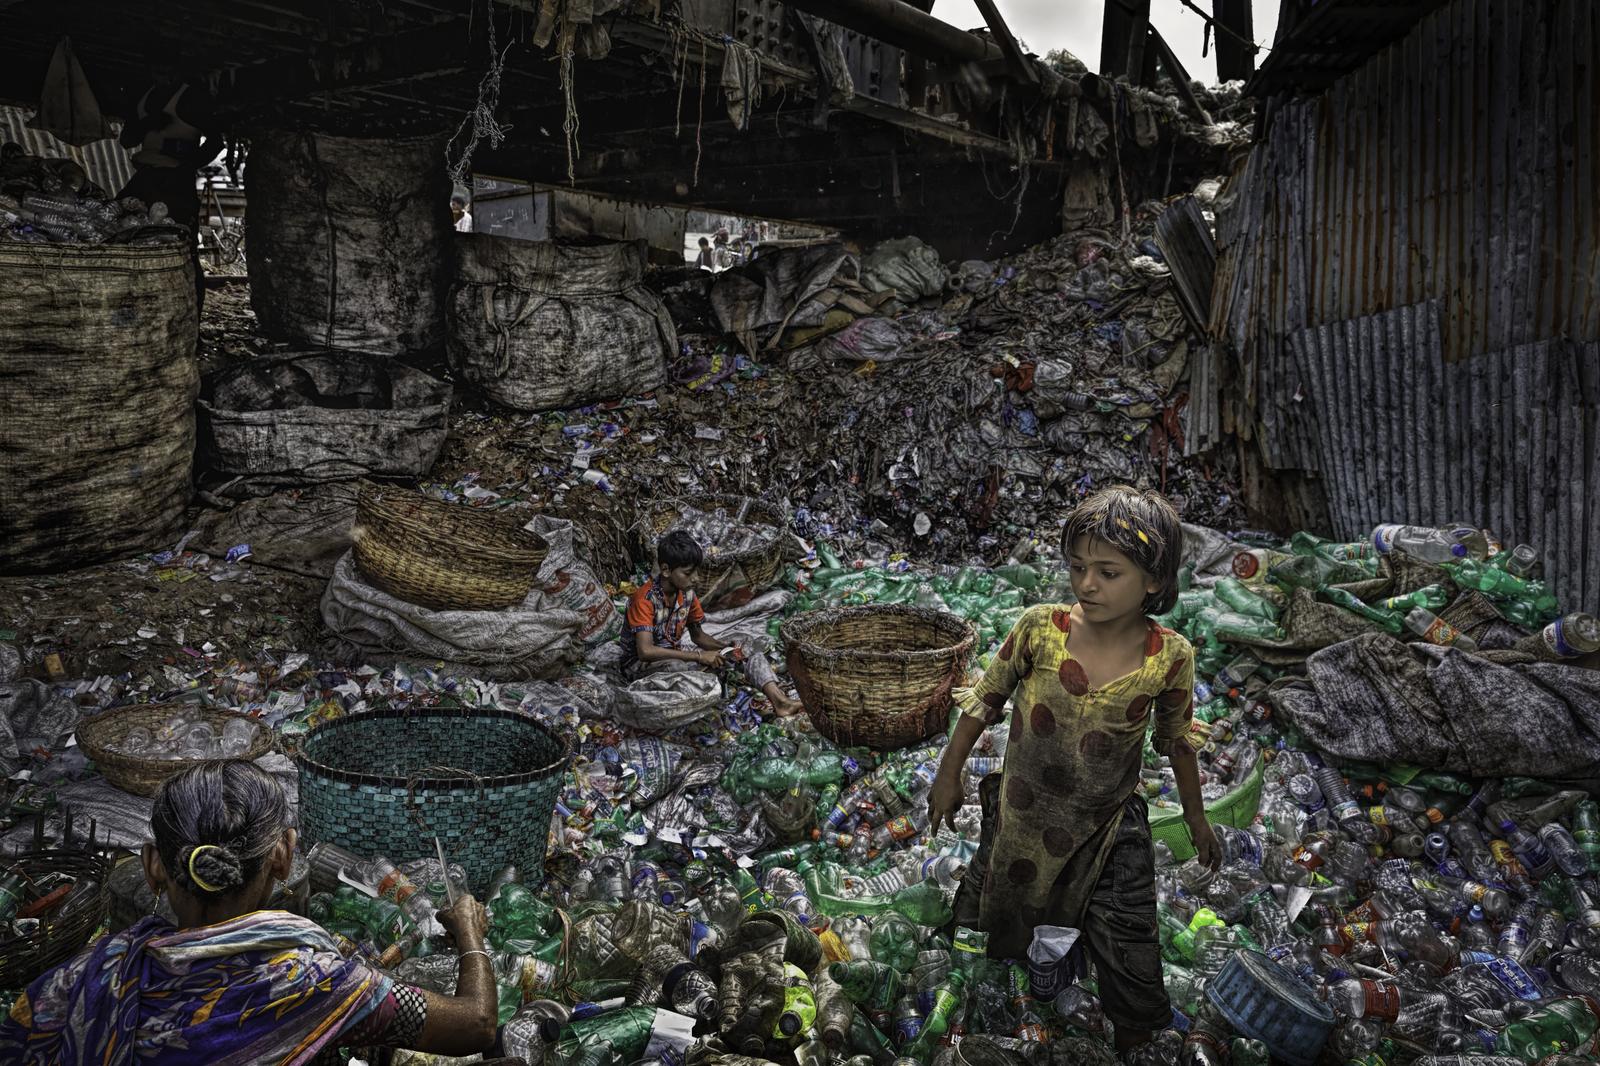 Family Sorts Plastic Under Bridge